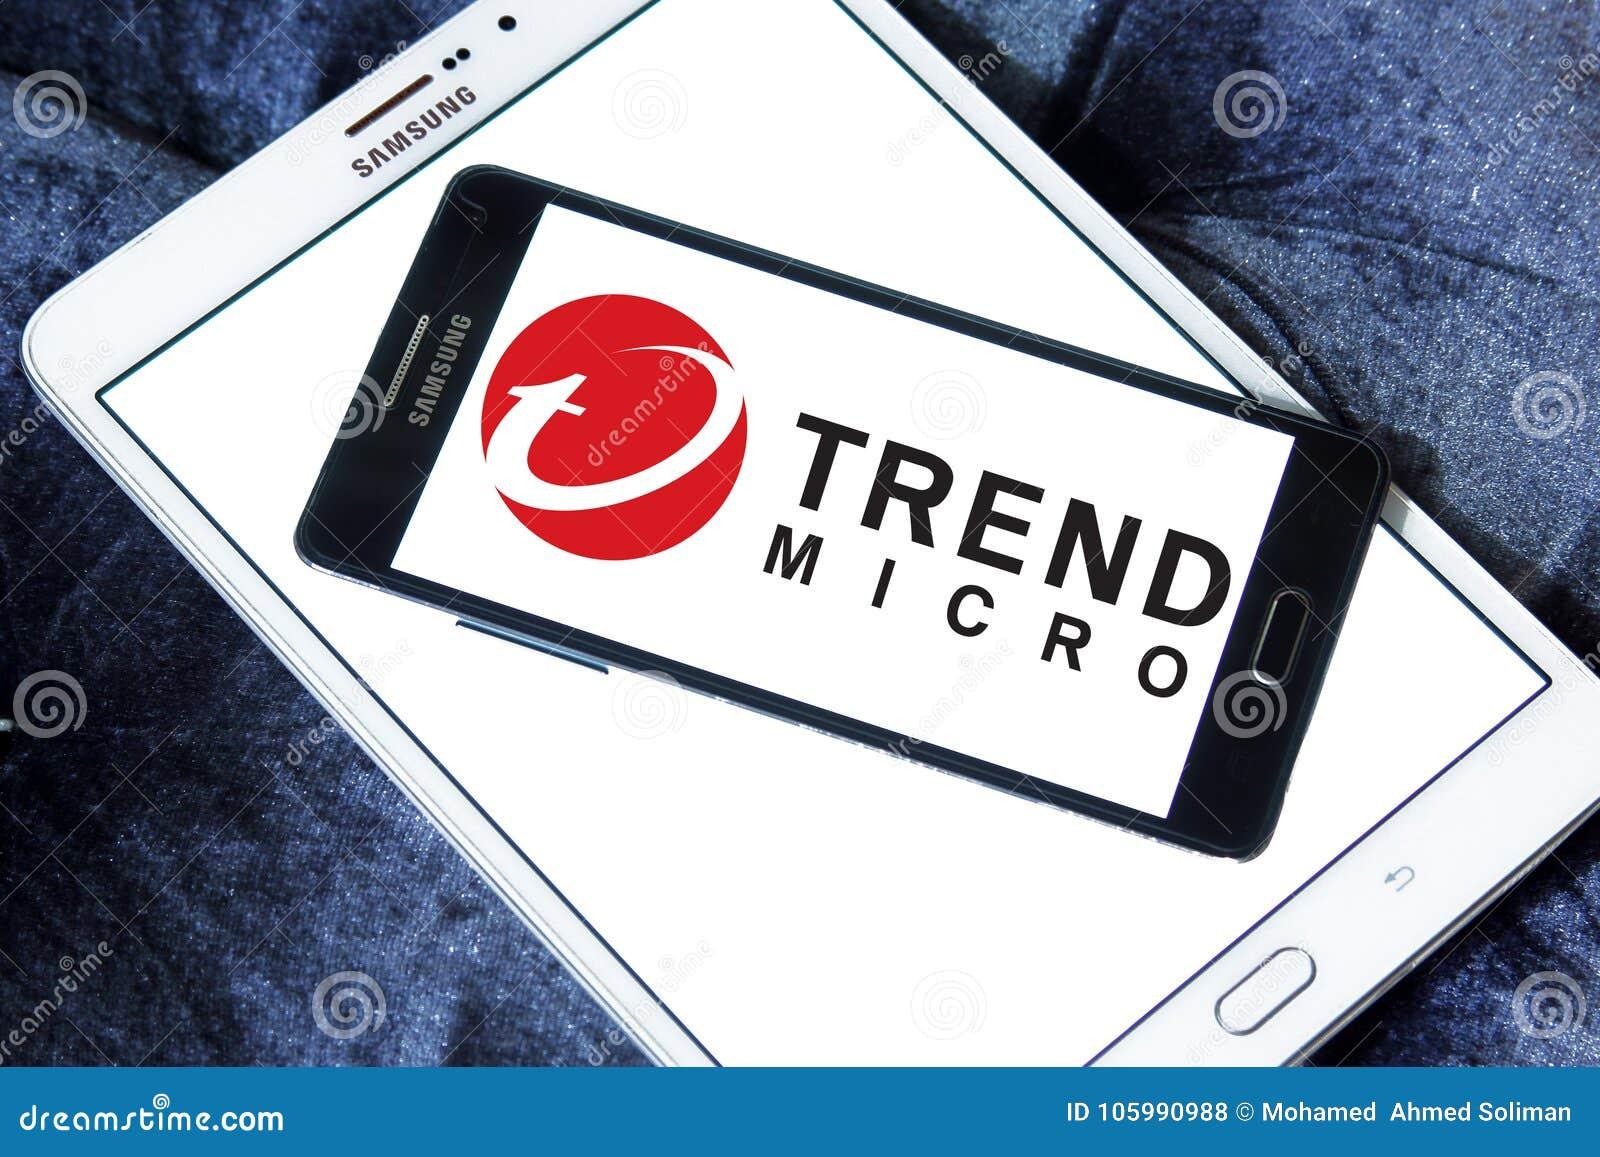 Trend Micro company logo editorial stock photo  Image of avast